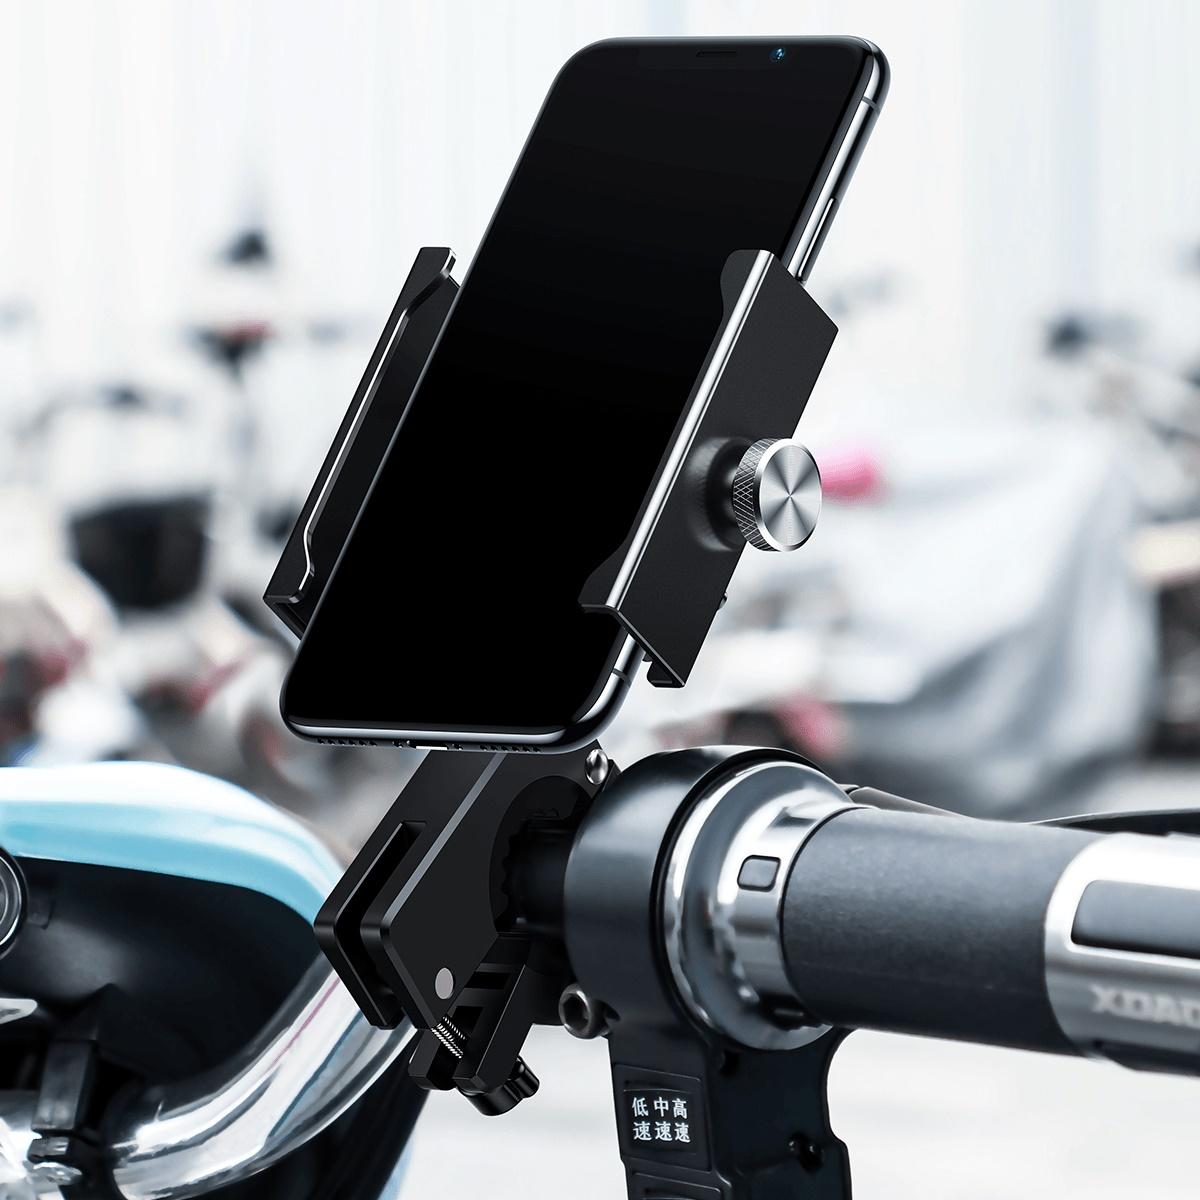 Baseus Motorcycle Bicycle Phone Holder For Iphone 11 Xiaomi Universal Bike Mobile Phone Stand Handlebar Clip Moto Mount Bracket.